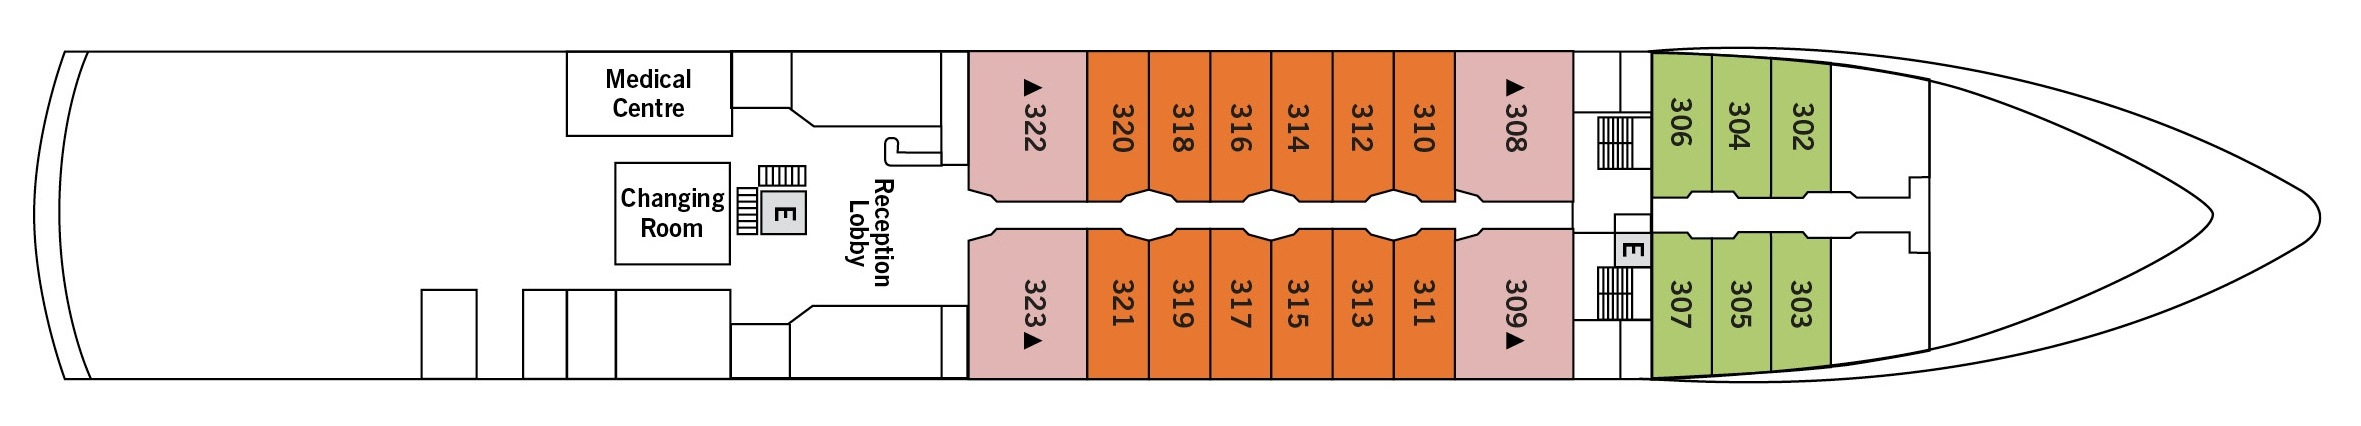 Silversea Cruises Silver Explorer Deck Plans Deck 3.jpg